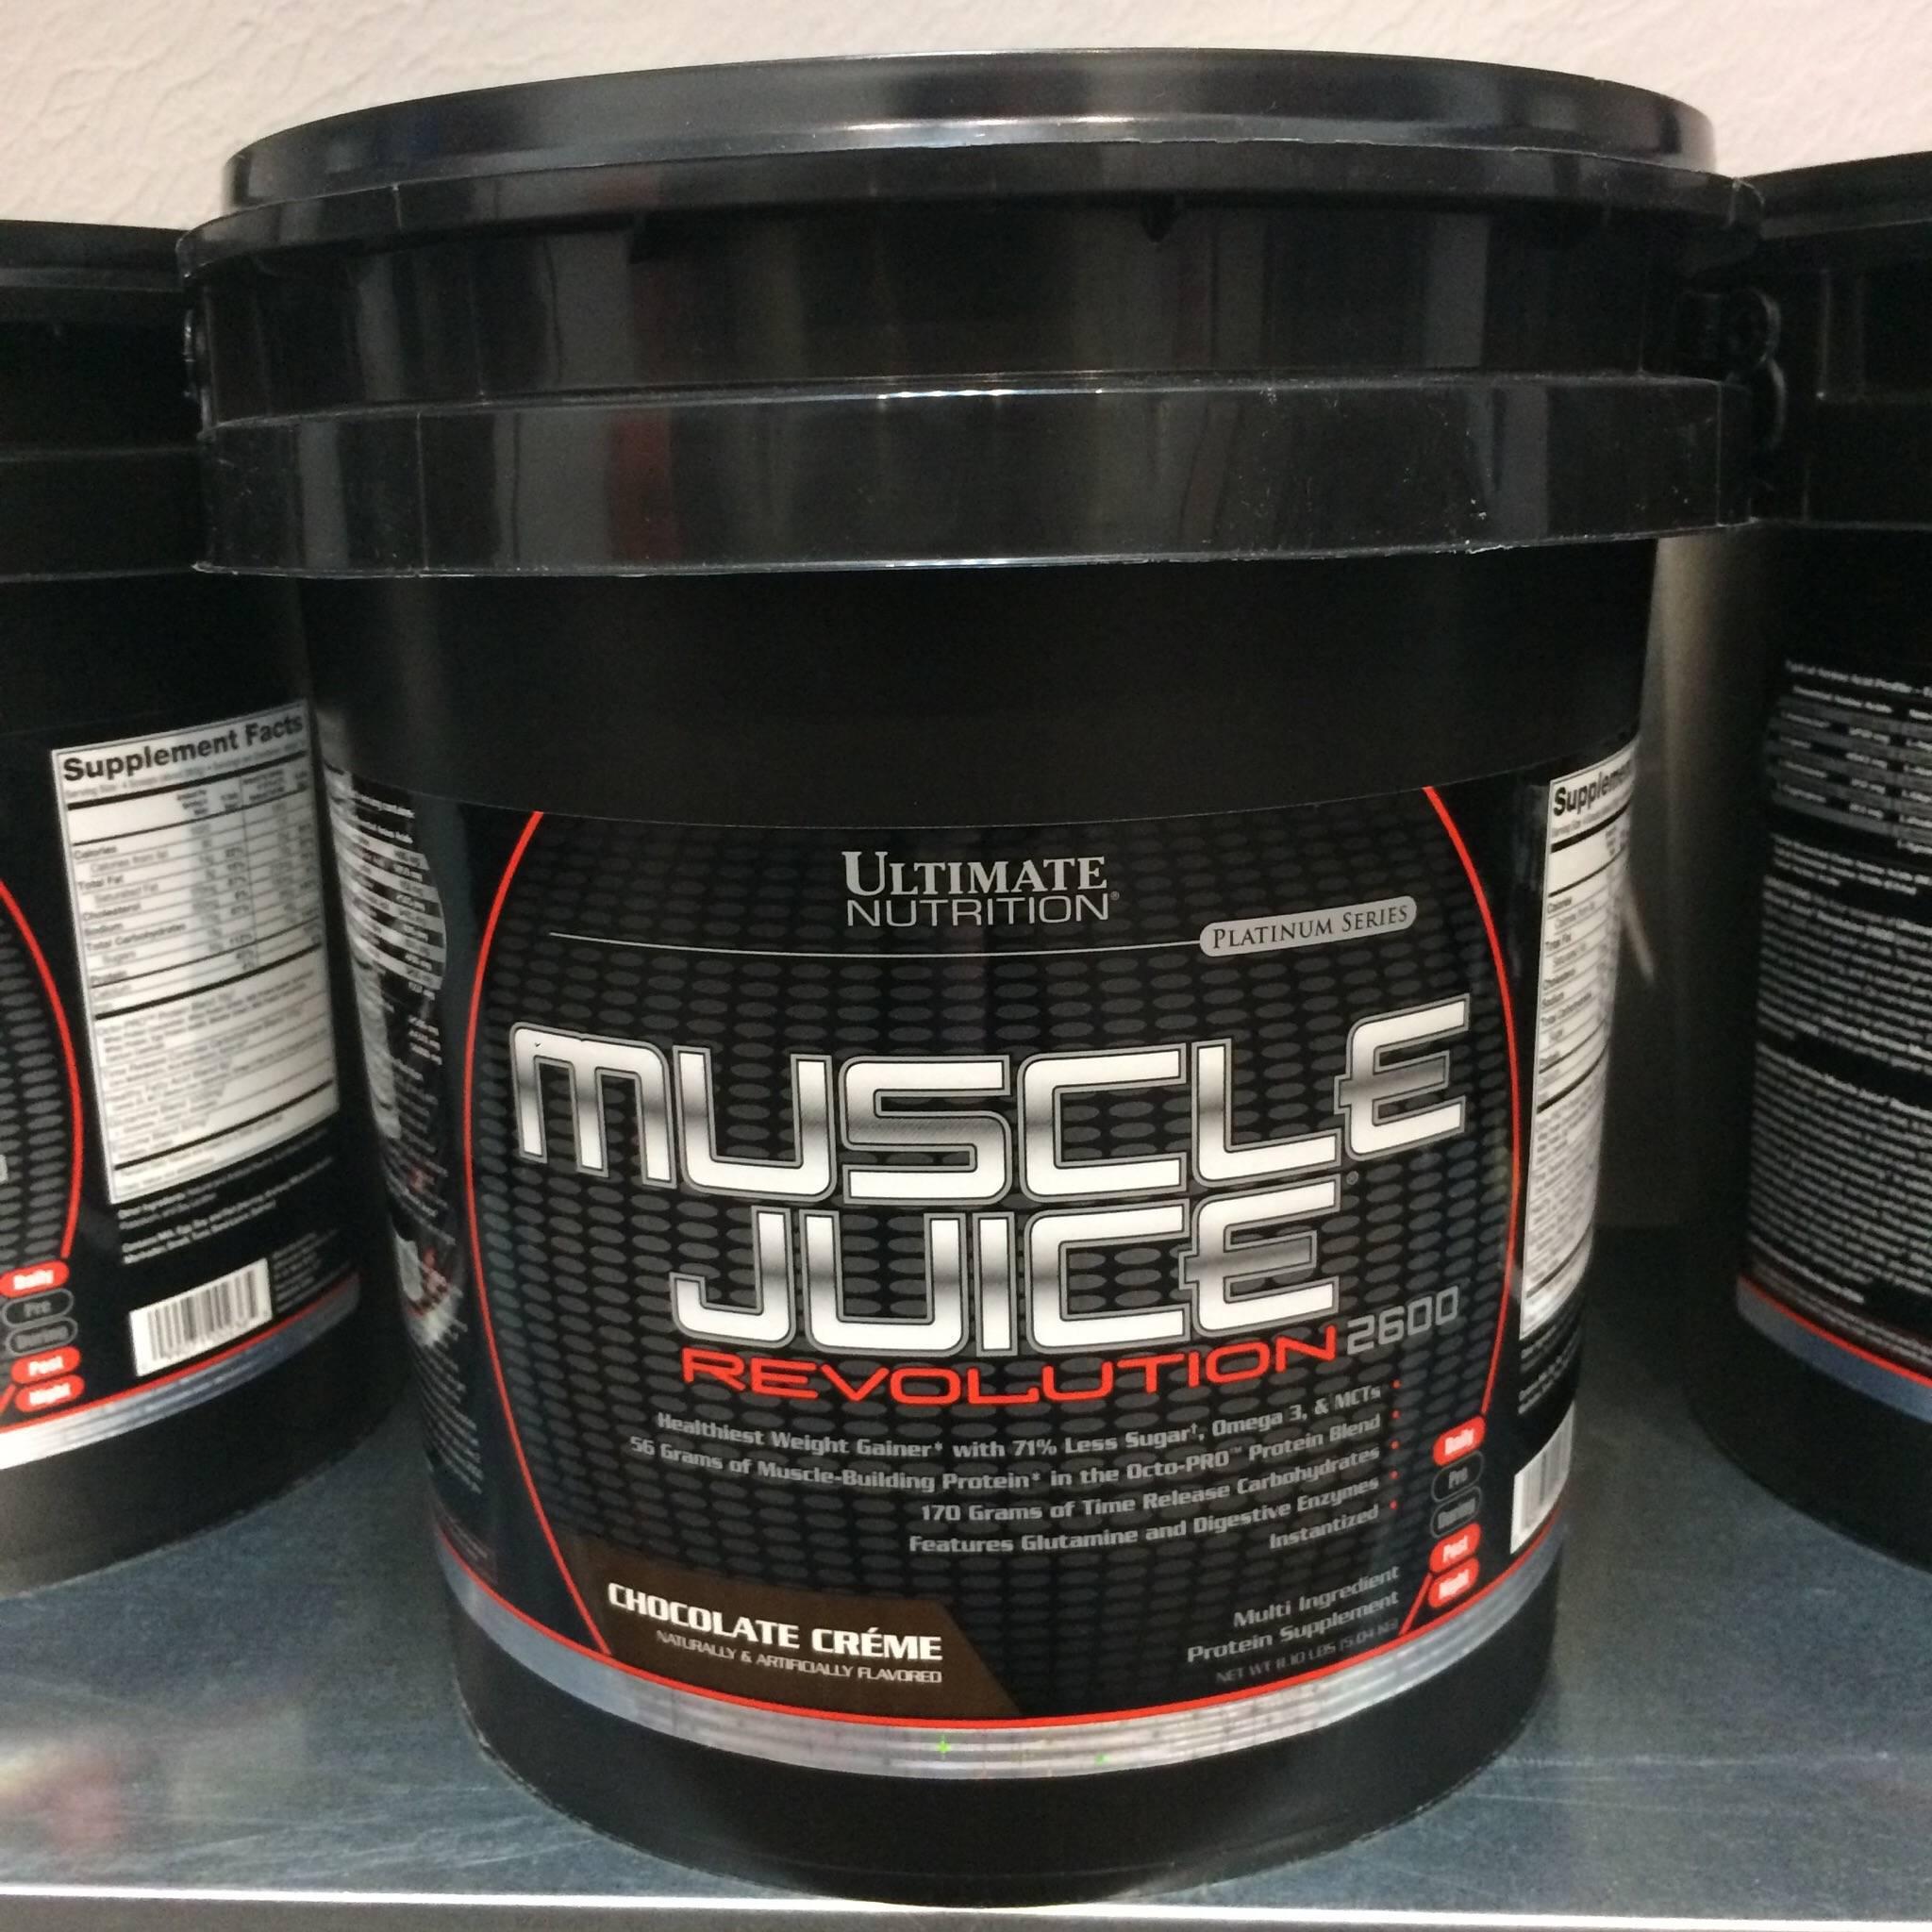 Muscle juice revolution 2600 ultimate nutrition описание, состав, как принимать